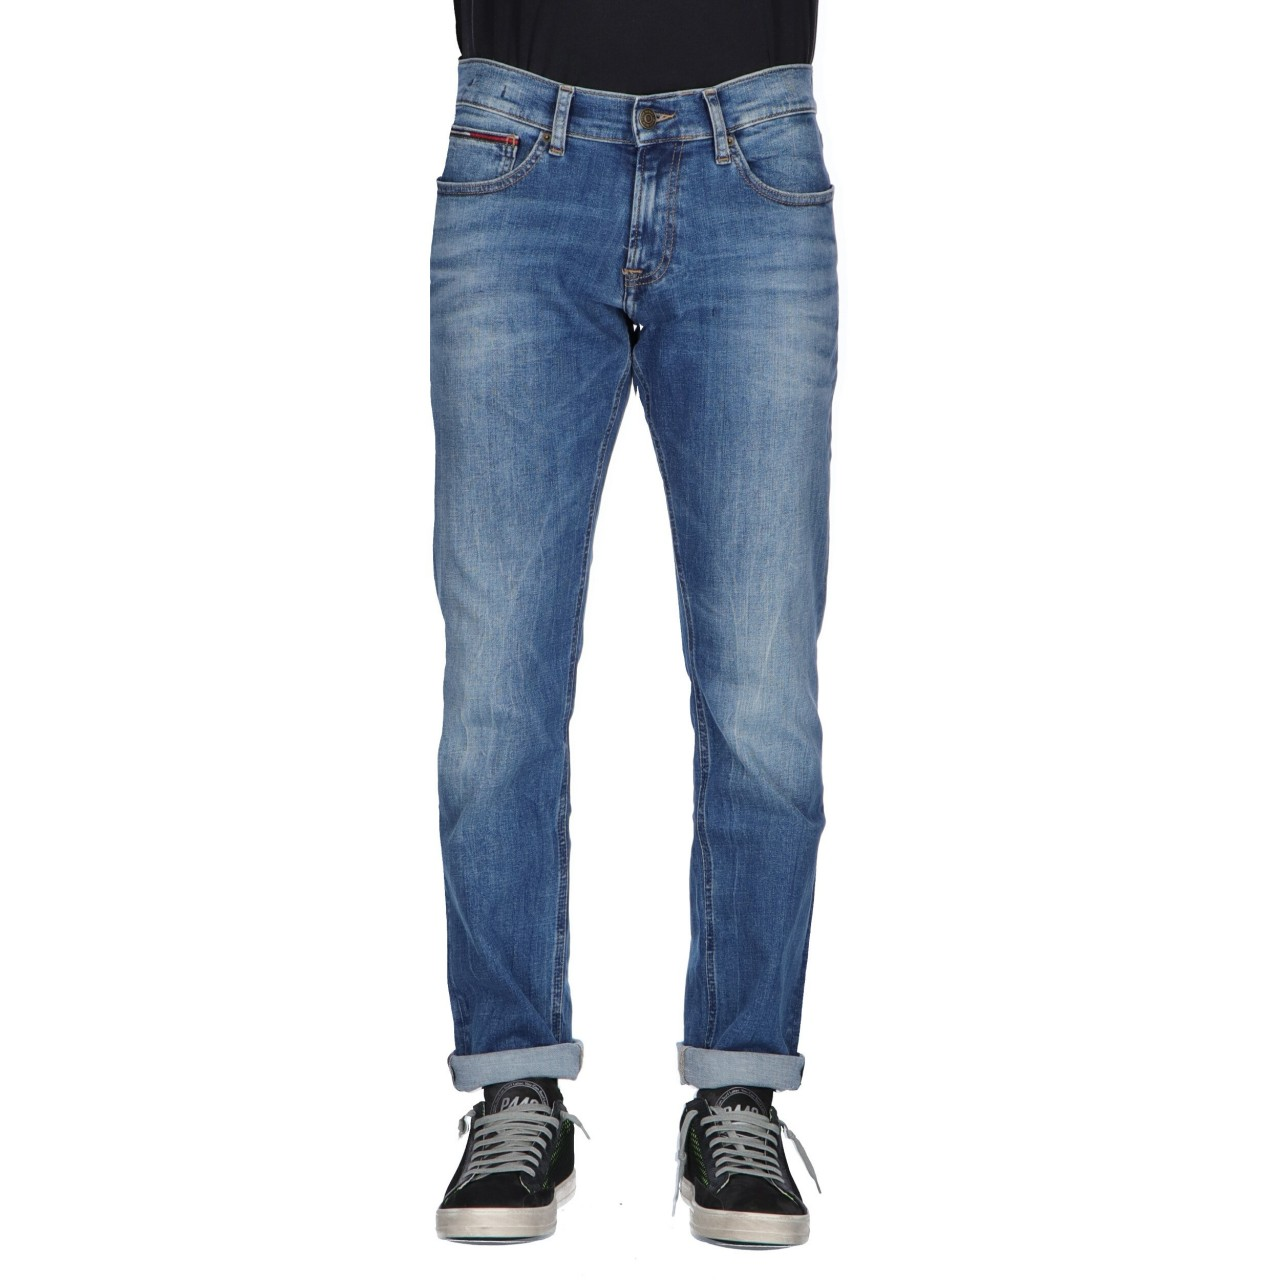 Tommy hilfiger Uomo Jeans Tommy Hilfiger Jeans Uomo Slim Scanton Dynamic 05627L